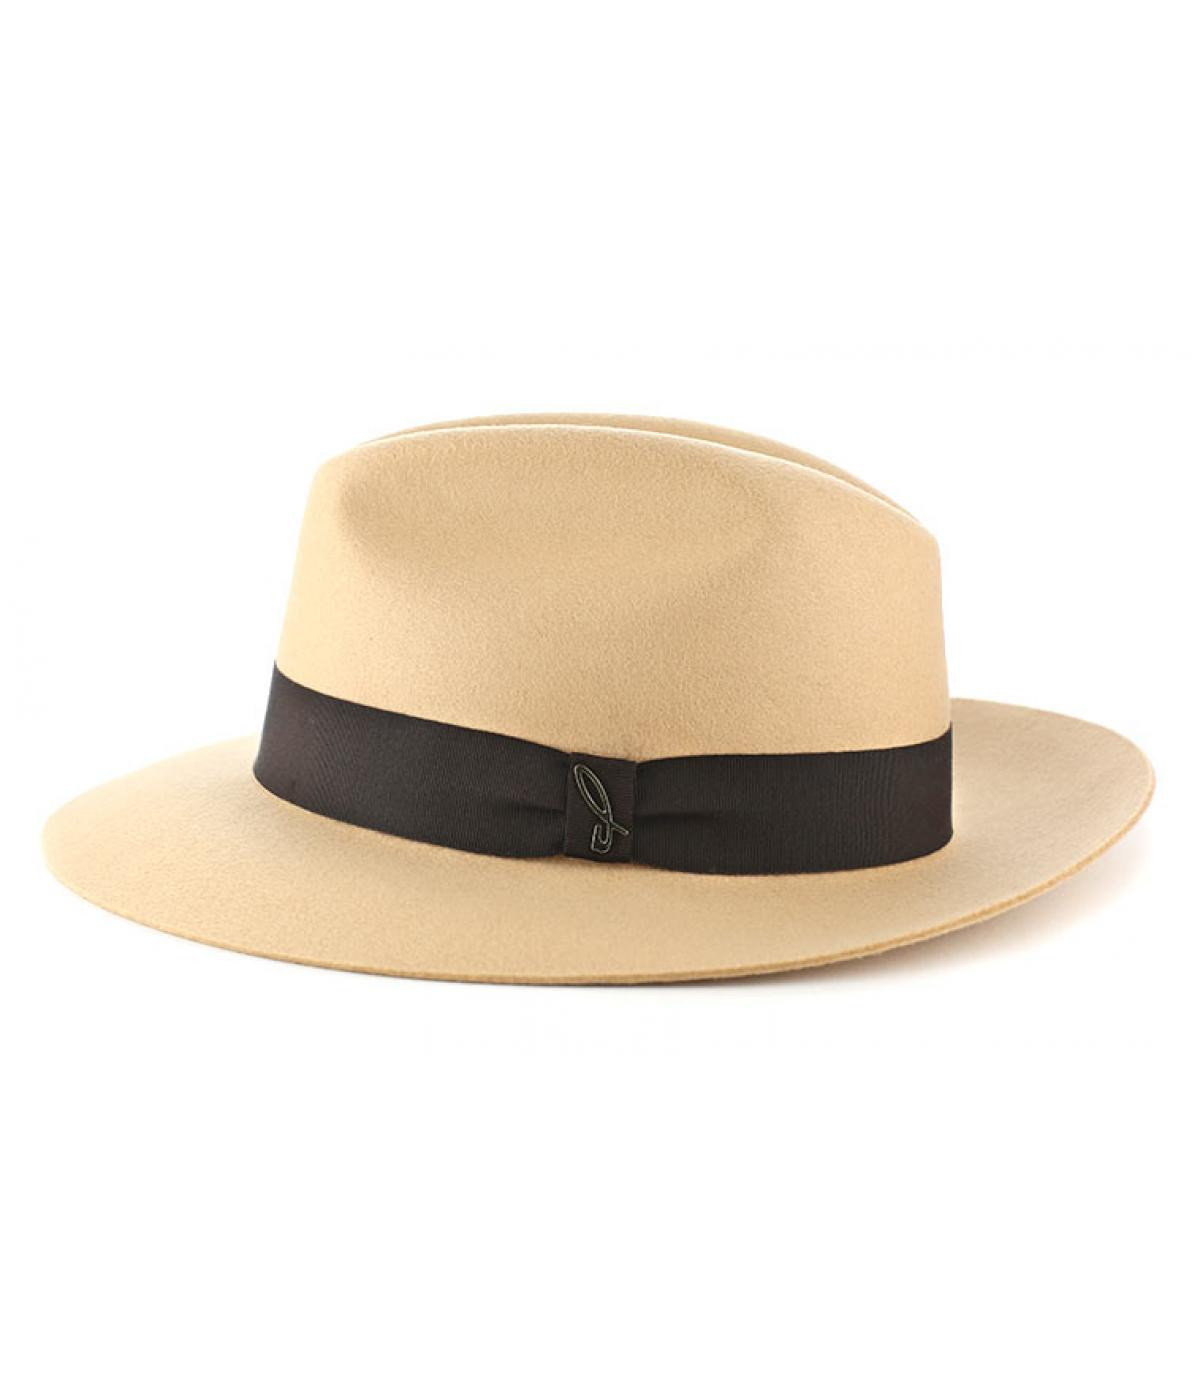 Sombrero feutre Doria beige